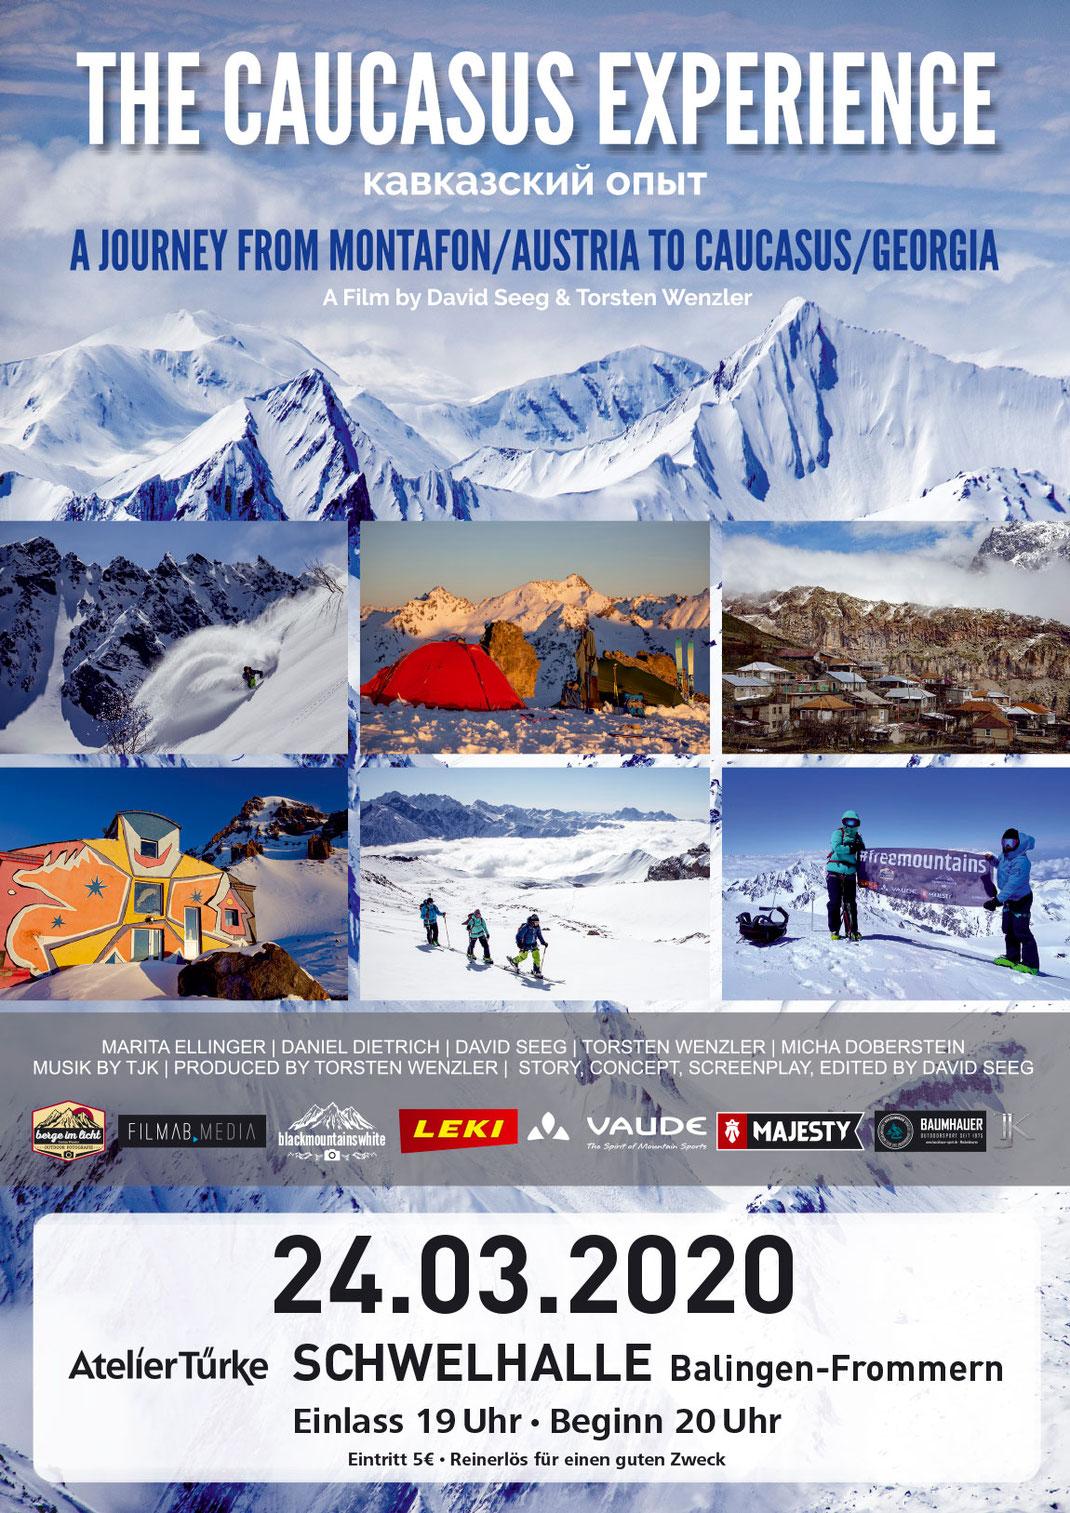 The Caucasus Experience - A journey from Montafon/Austria to Caucasus/Georgia - Movie 52min.